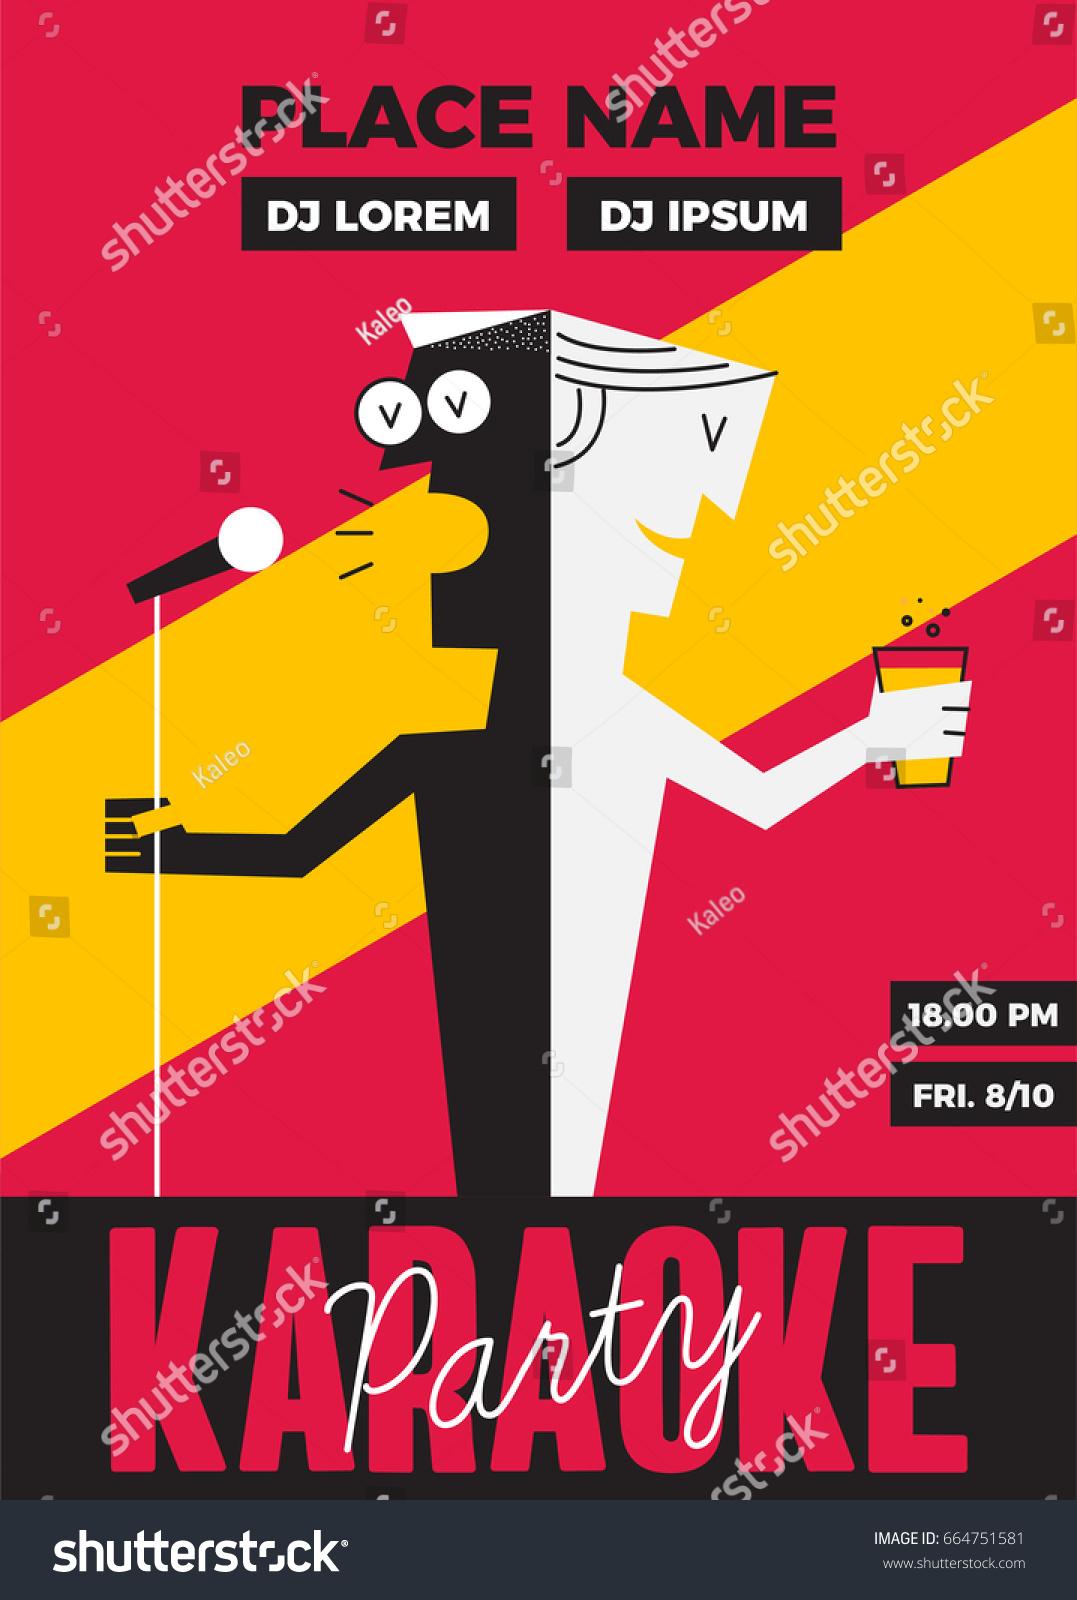 Karaoke Party Invitation Poster Design Text Stock Vector 664751581 ...